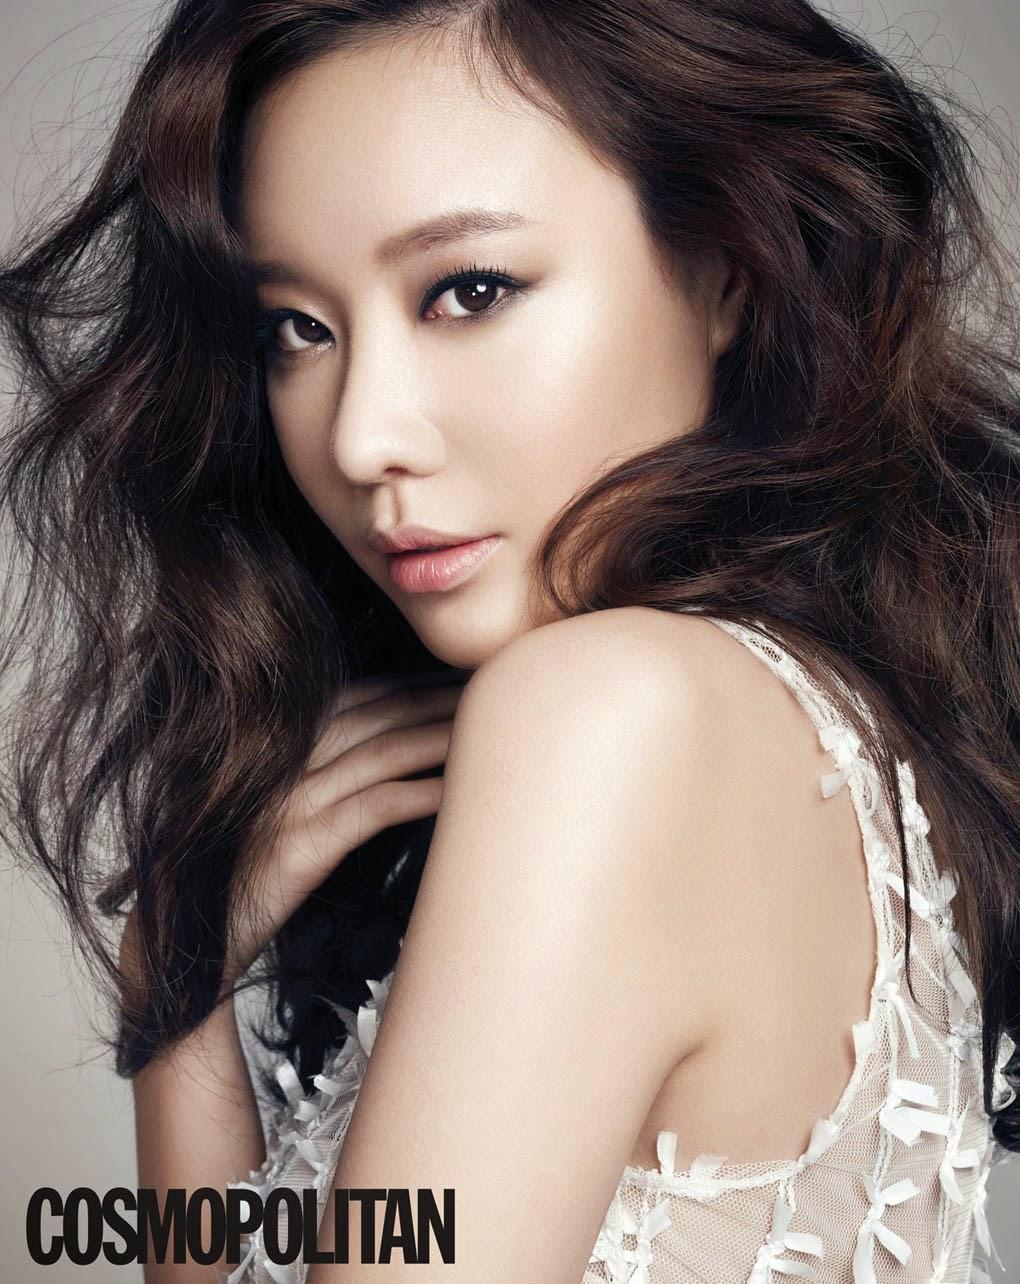 Kim Ah Joong - Cosmopolitan Magazine February Issue 2014